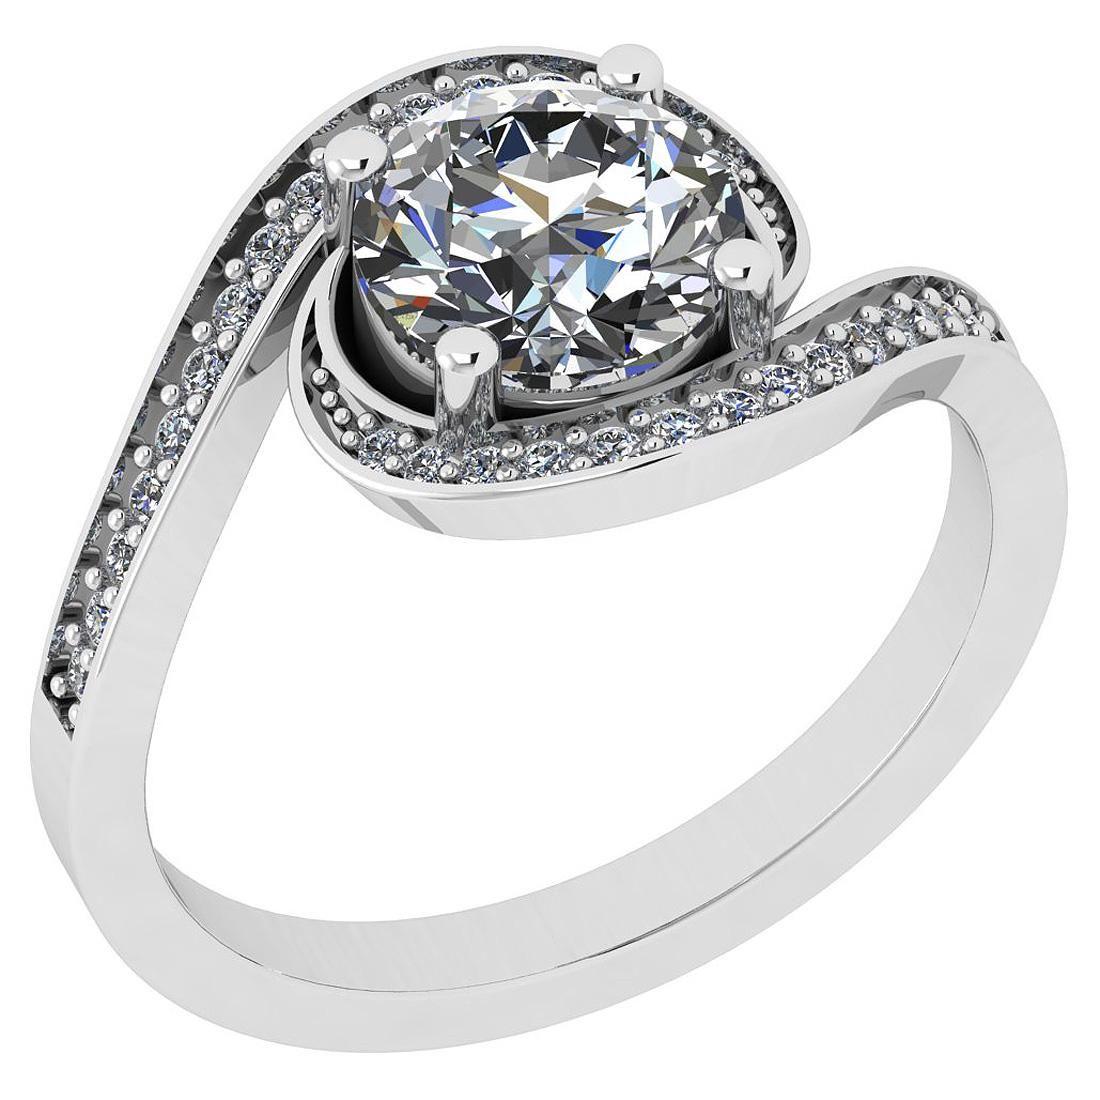 Certified 0.96 Ct Diamond I2/I3 10K White Gold Vintage